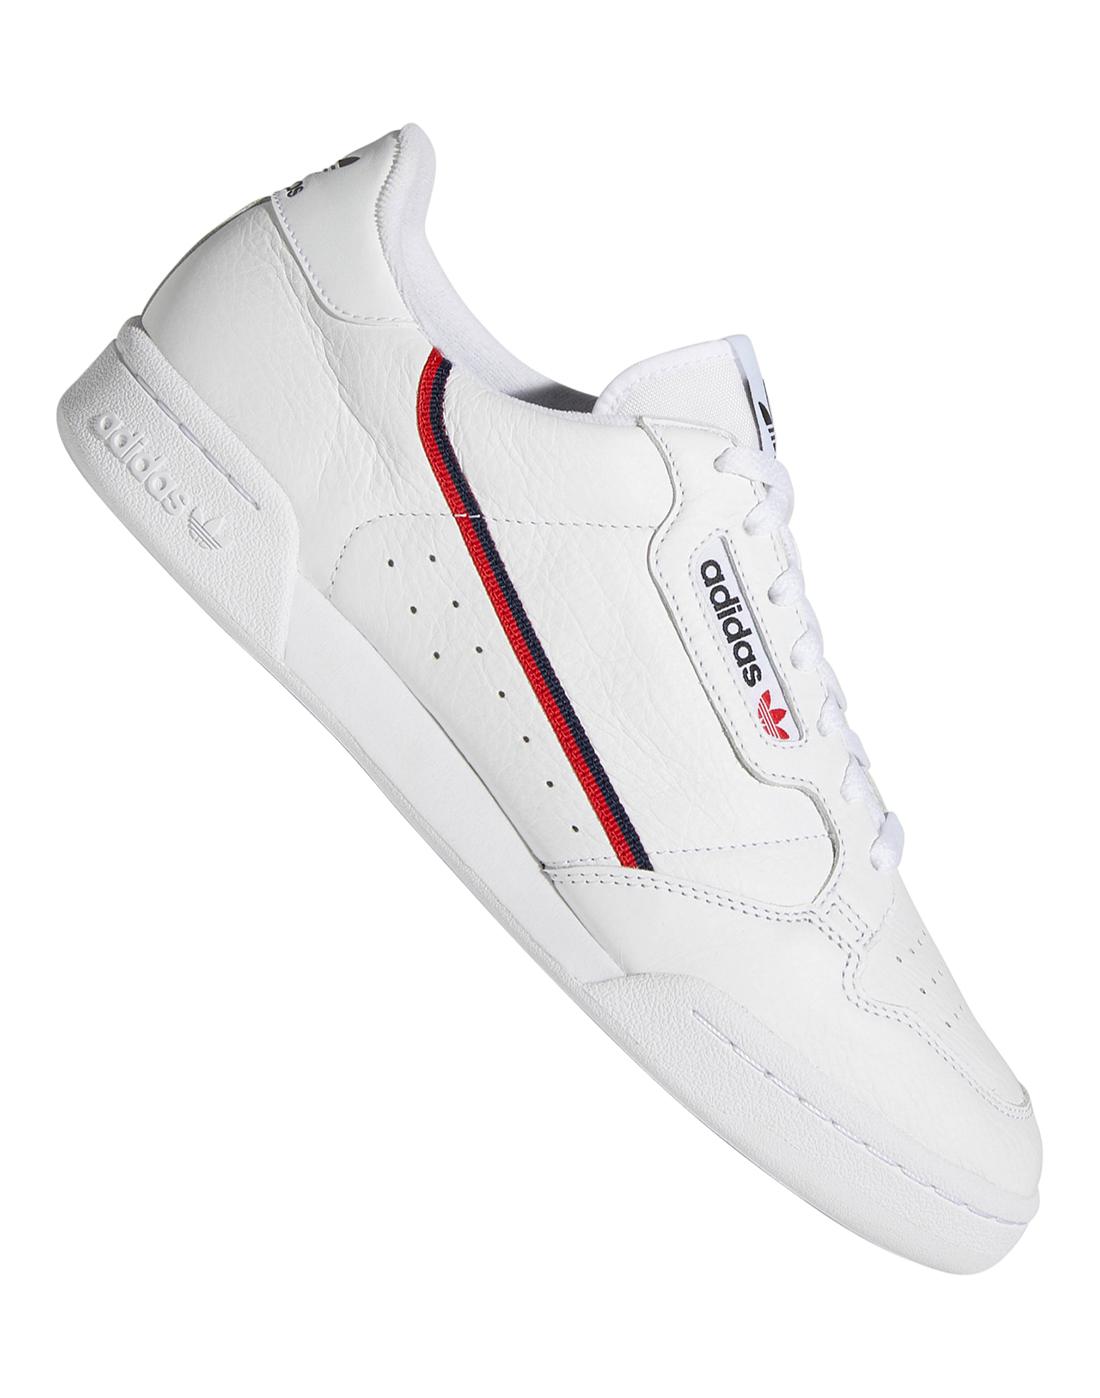 White adidas Originals Continental 80